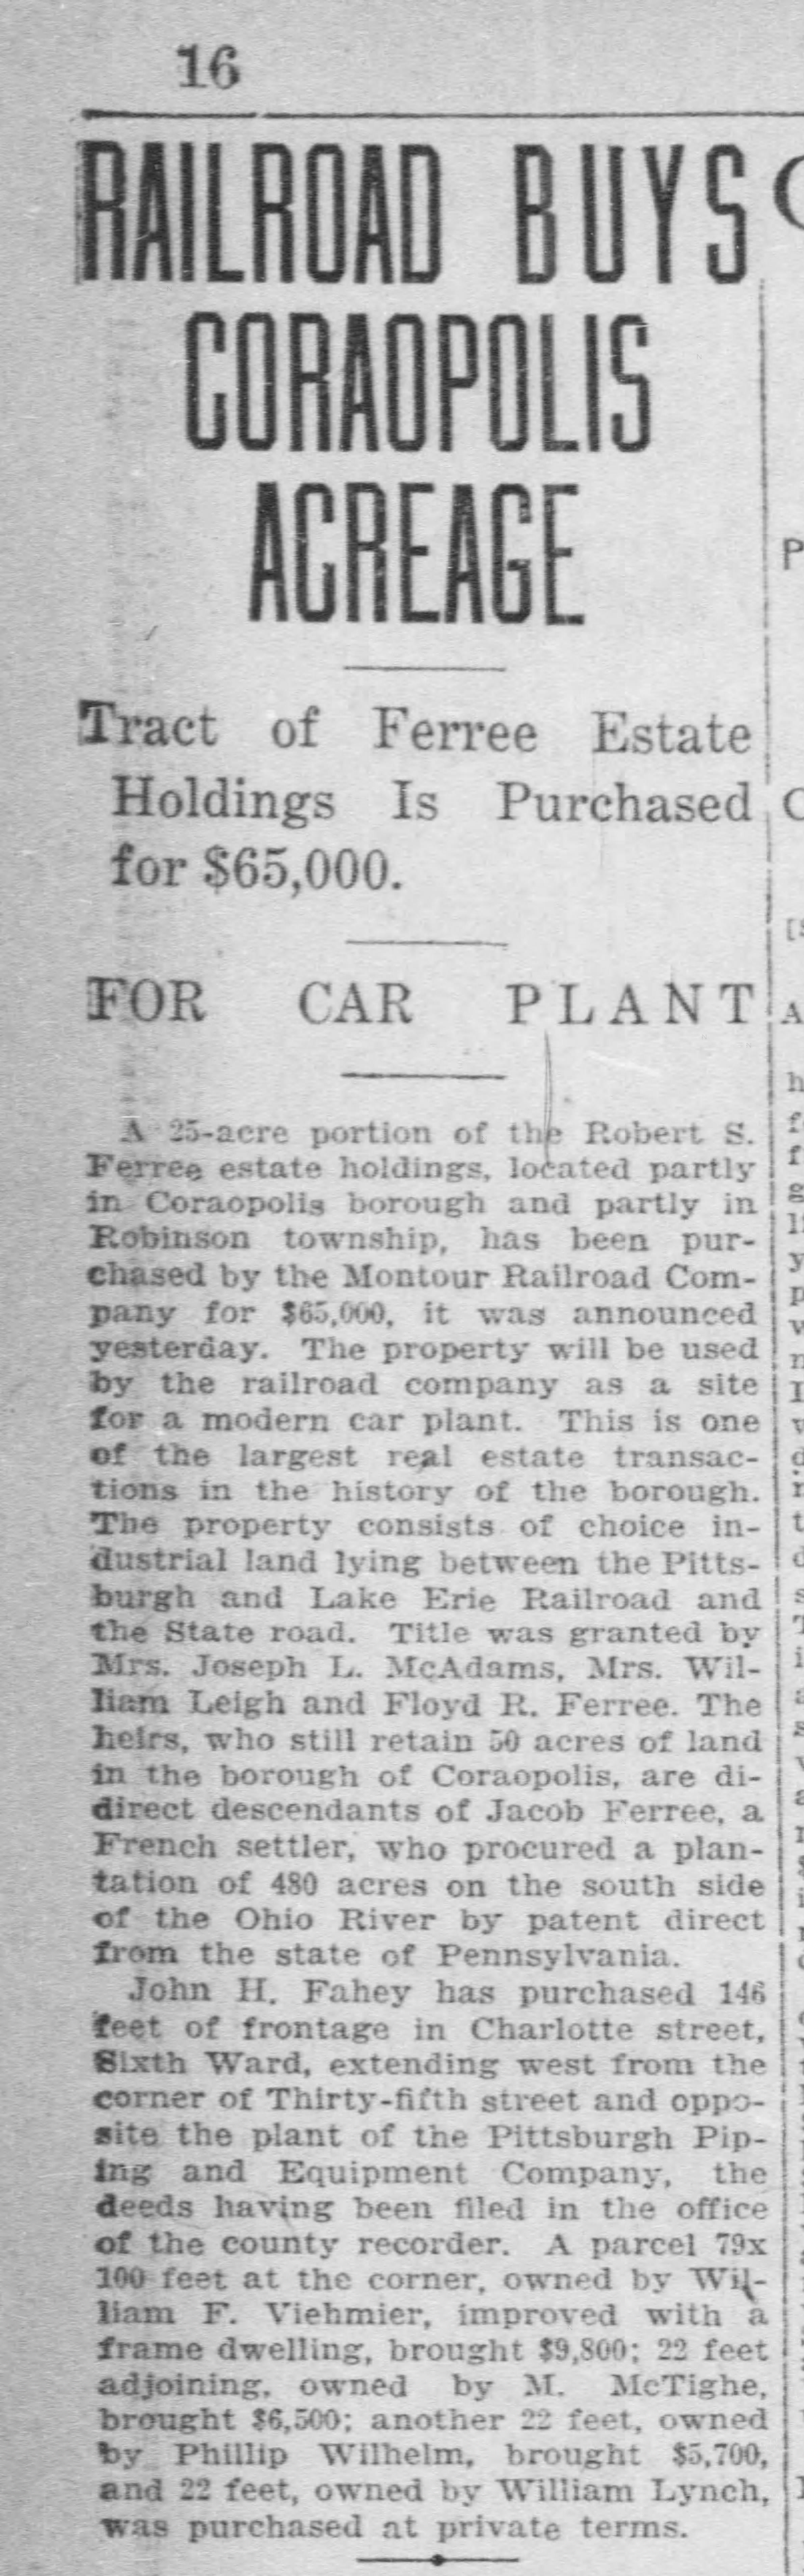 1918-12-19 Pittsburgh Post Gazette - RR Buys Coraopolis Acreage.jpg